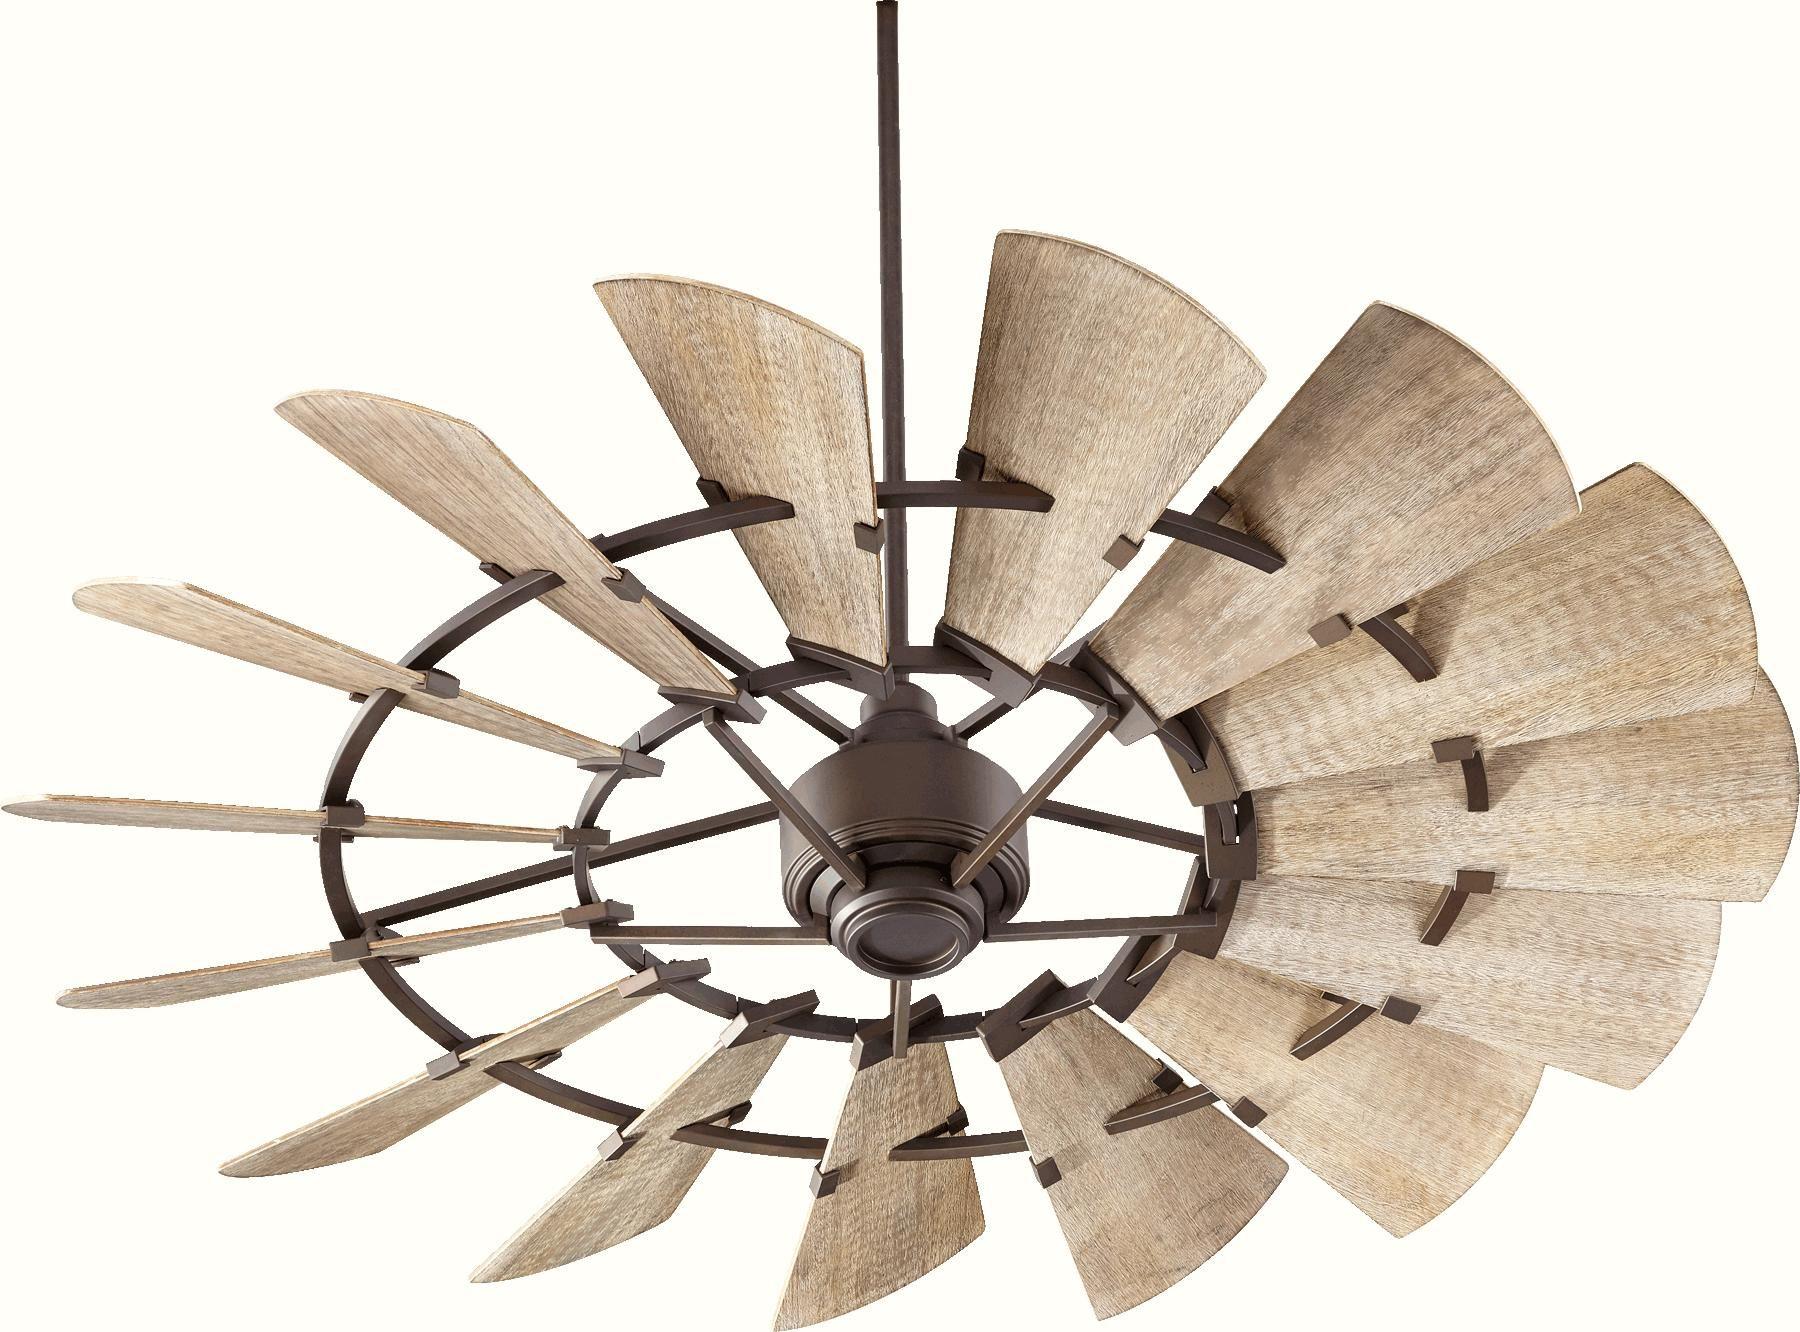 Quorum Windmill 60 86 Airflow Rating 5982 CFM Cubic Feet